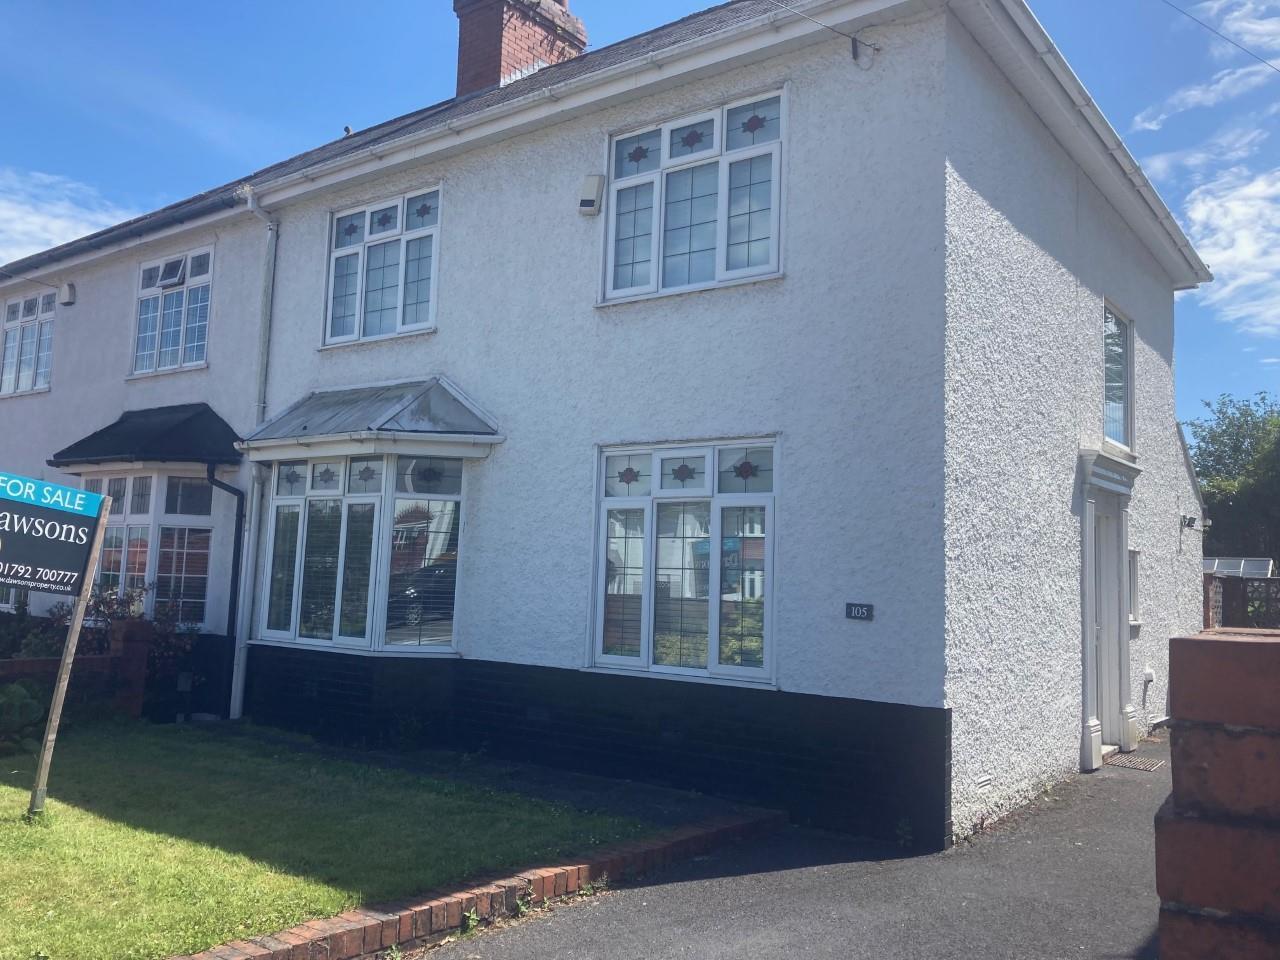 Pentrepoeth Road, Morriston, Swansea, SA6 6AG